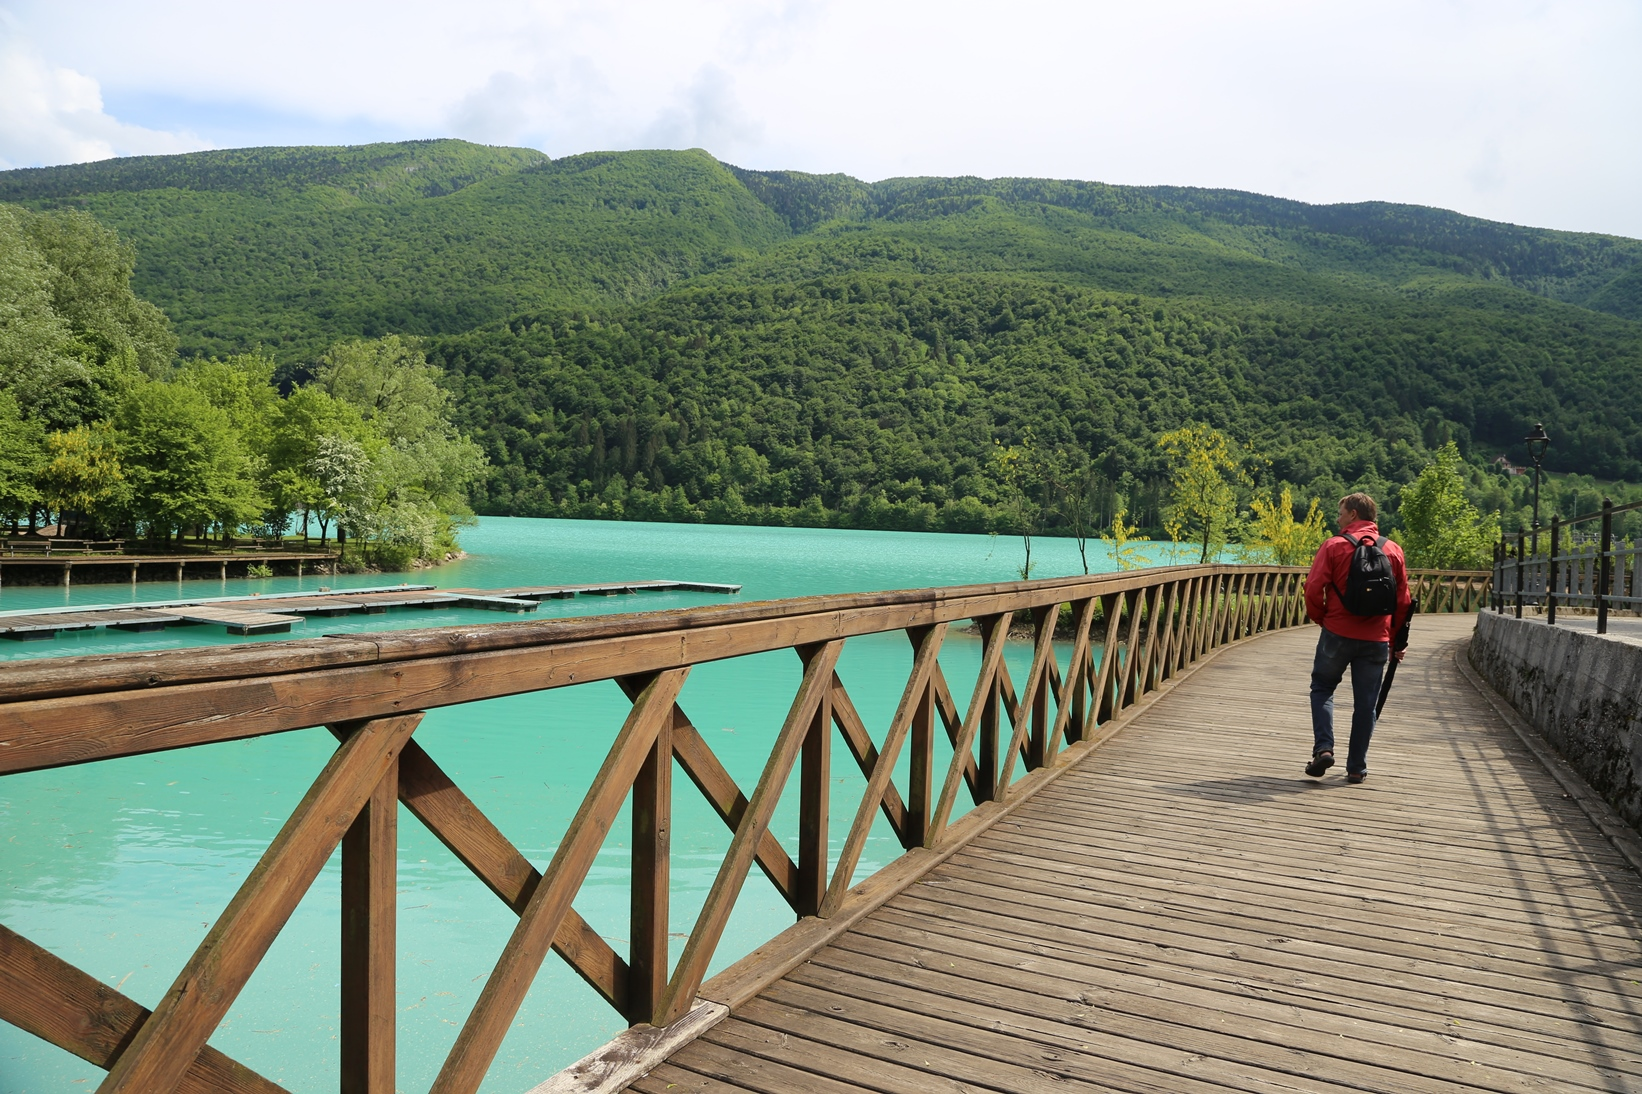 Am Lago di Barcis kann man gut Spazierengehen